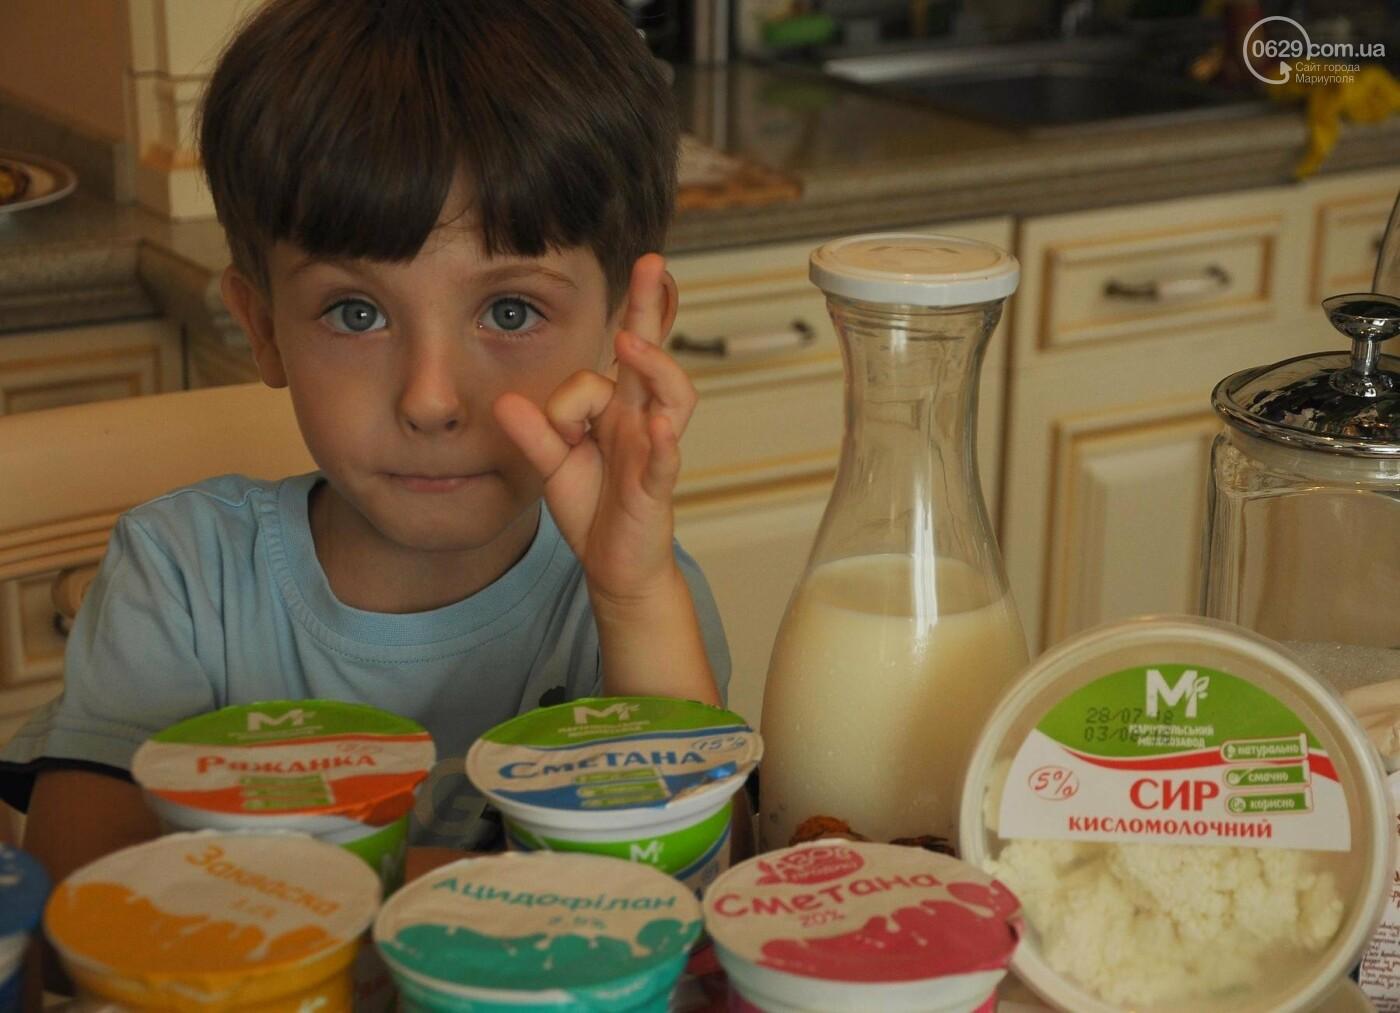 Мариупольский молокозавод дарит 1000 гривен, фото-8